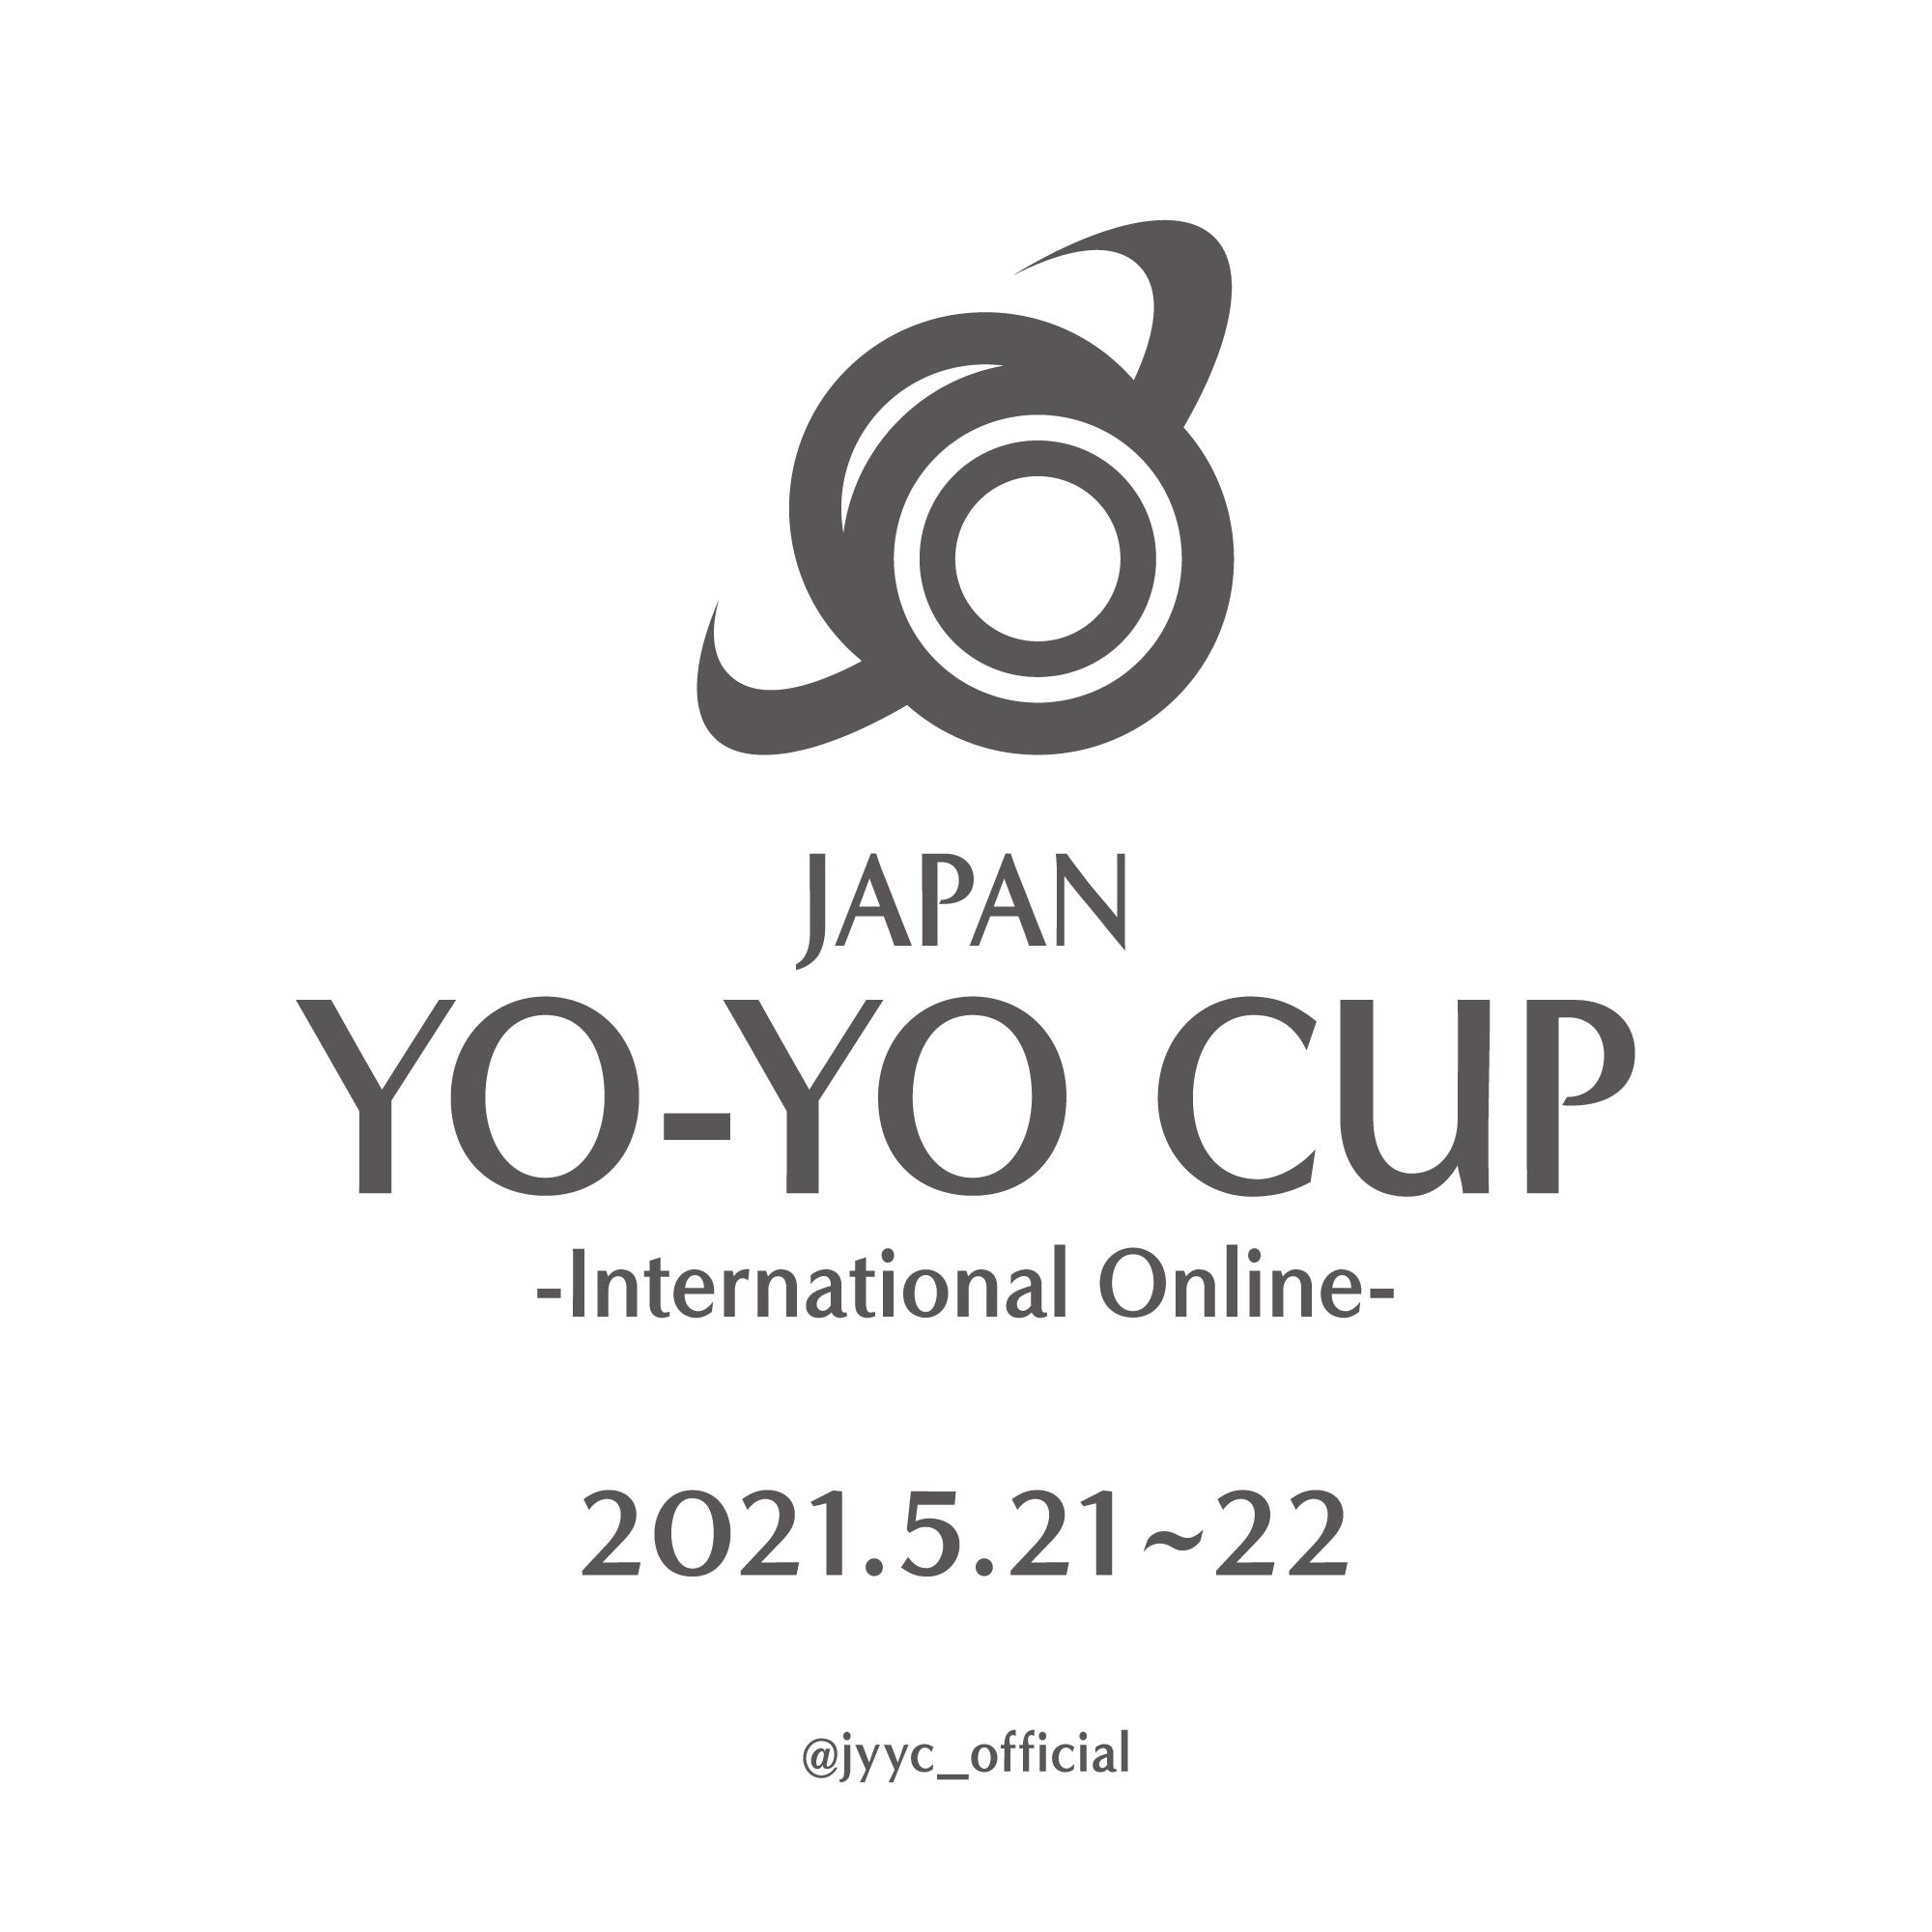 《#JYYCIO 2021》開催日程発表!/ Next Event Date Announcement!